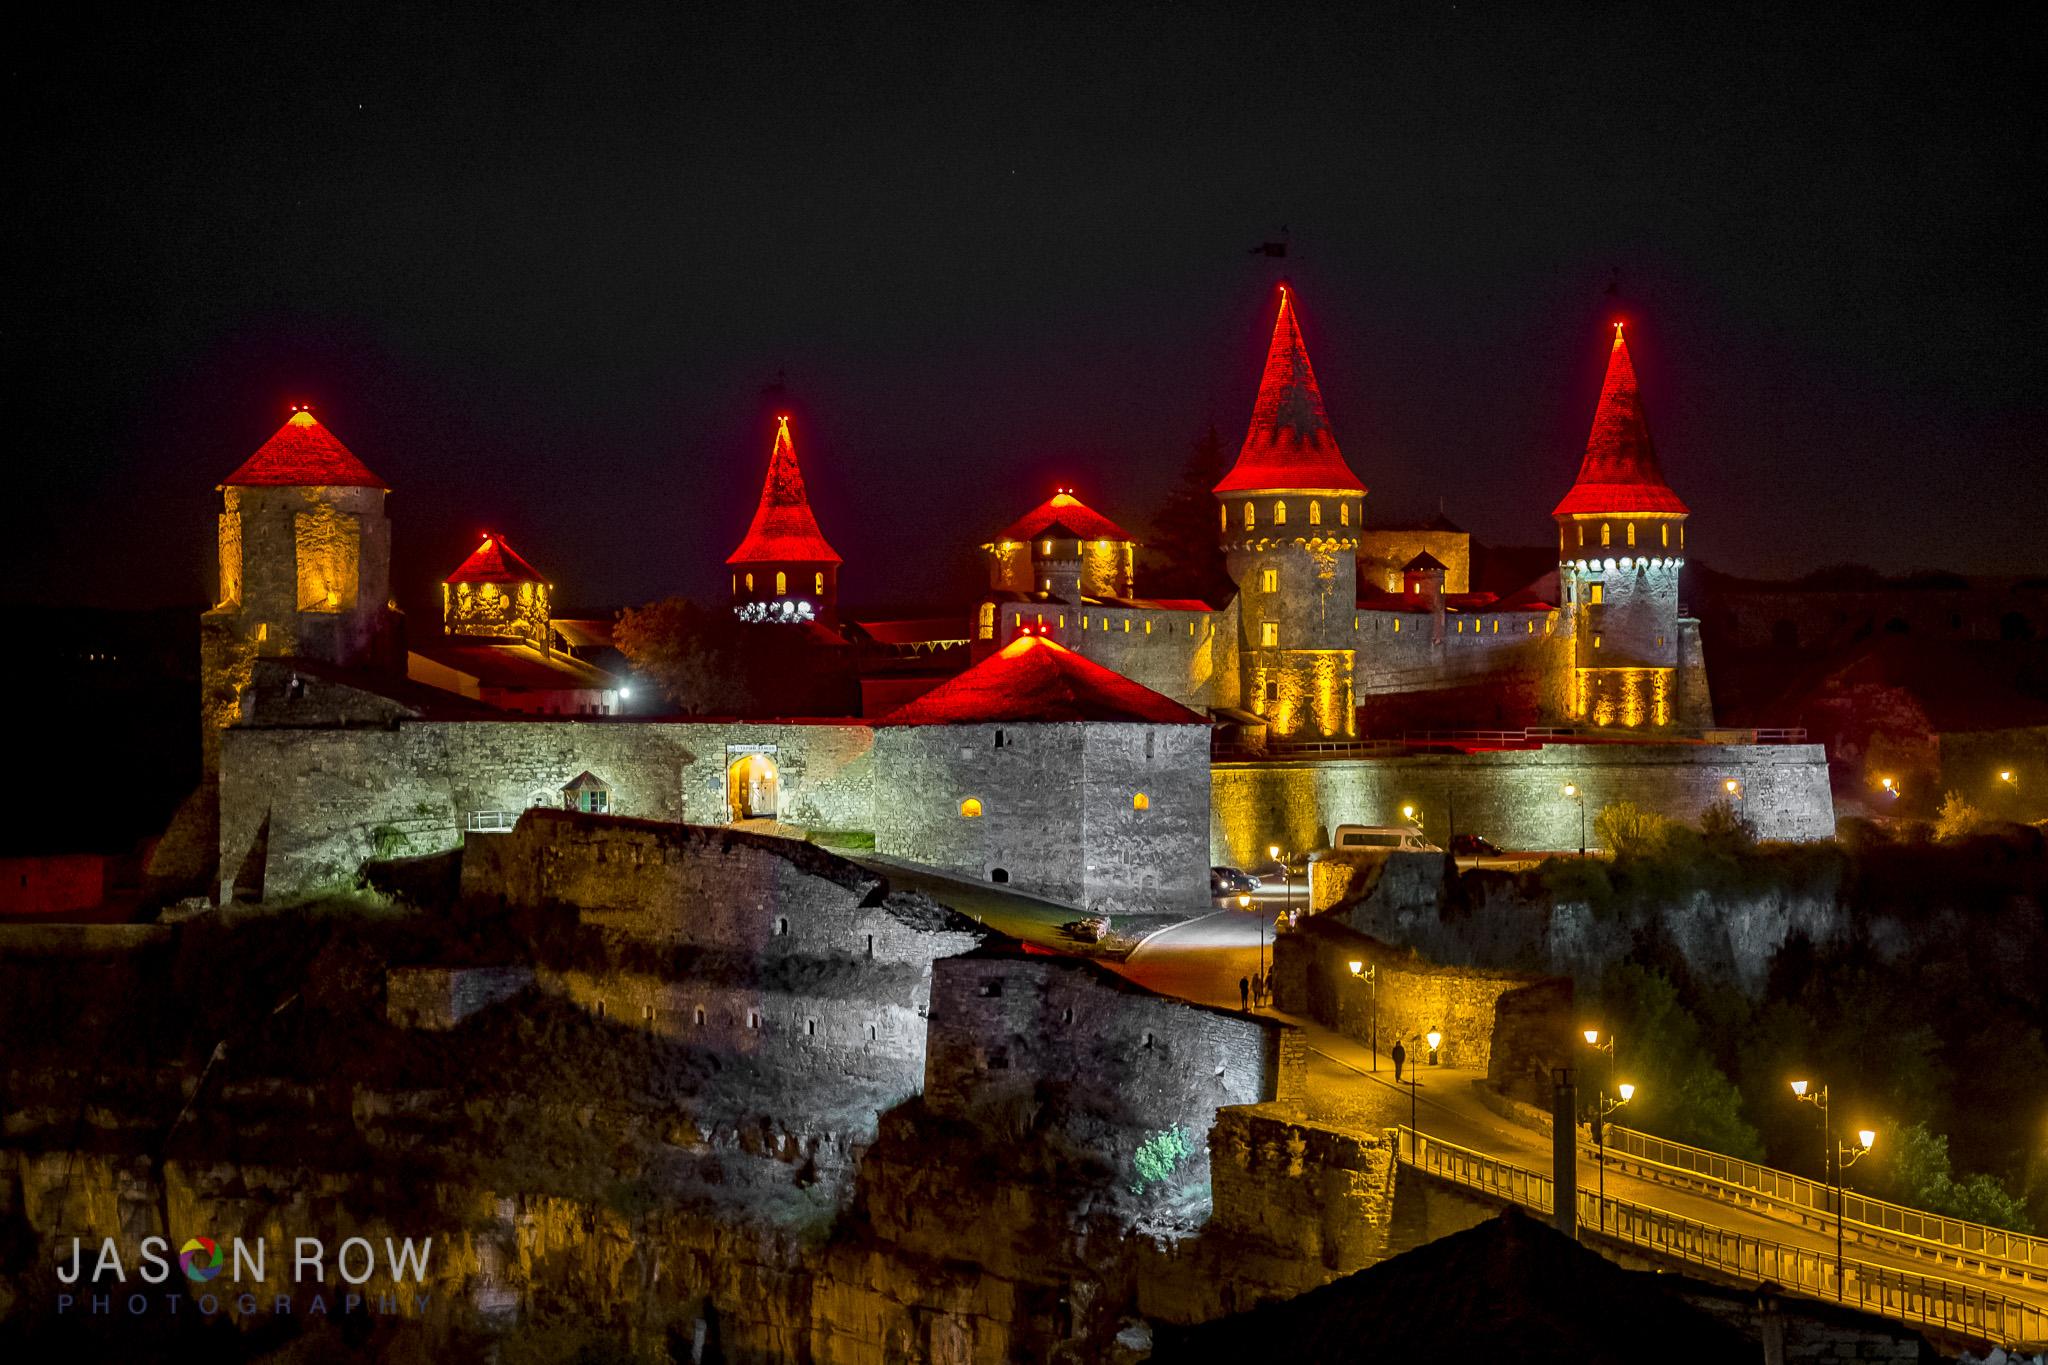 Genuine 14th Century Neon Lighting. By Jason Row Photography